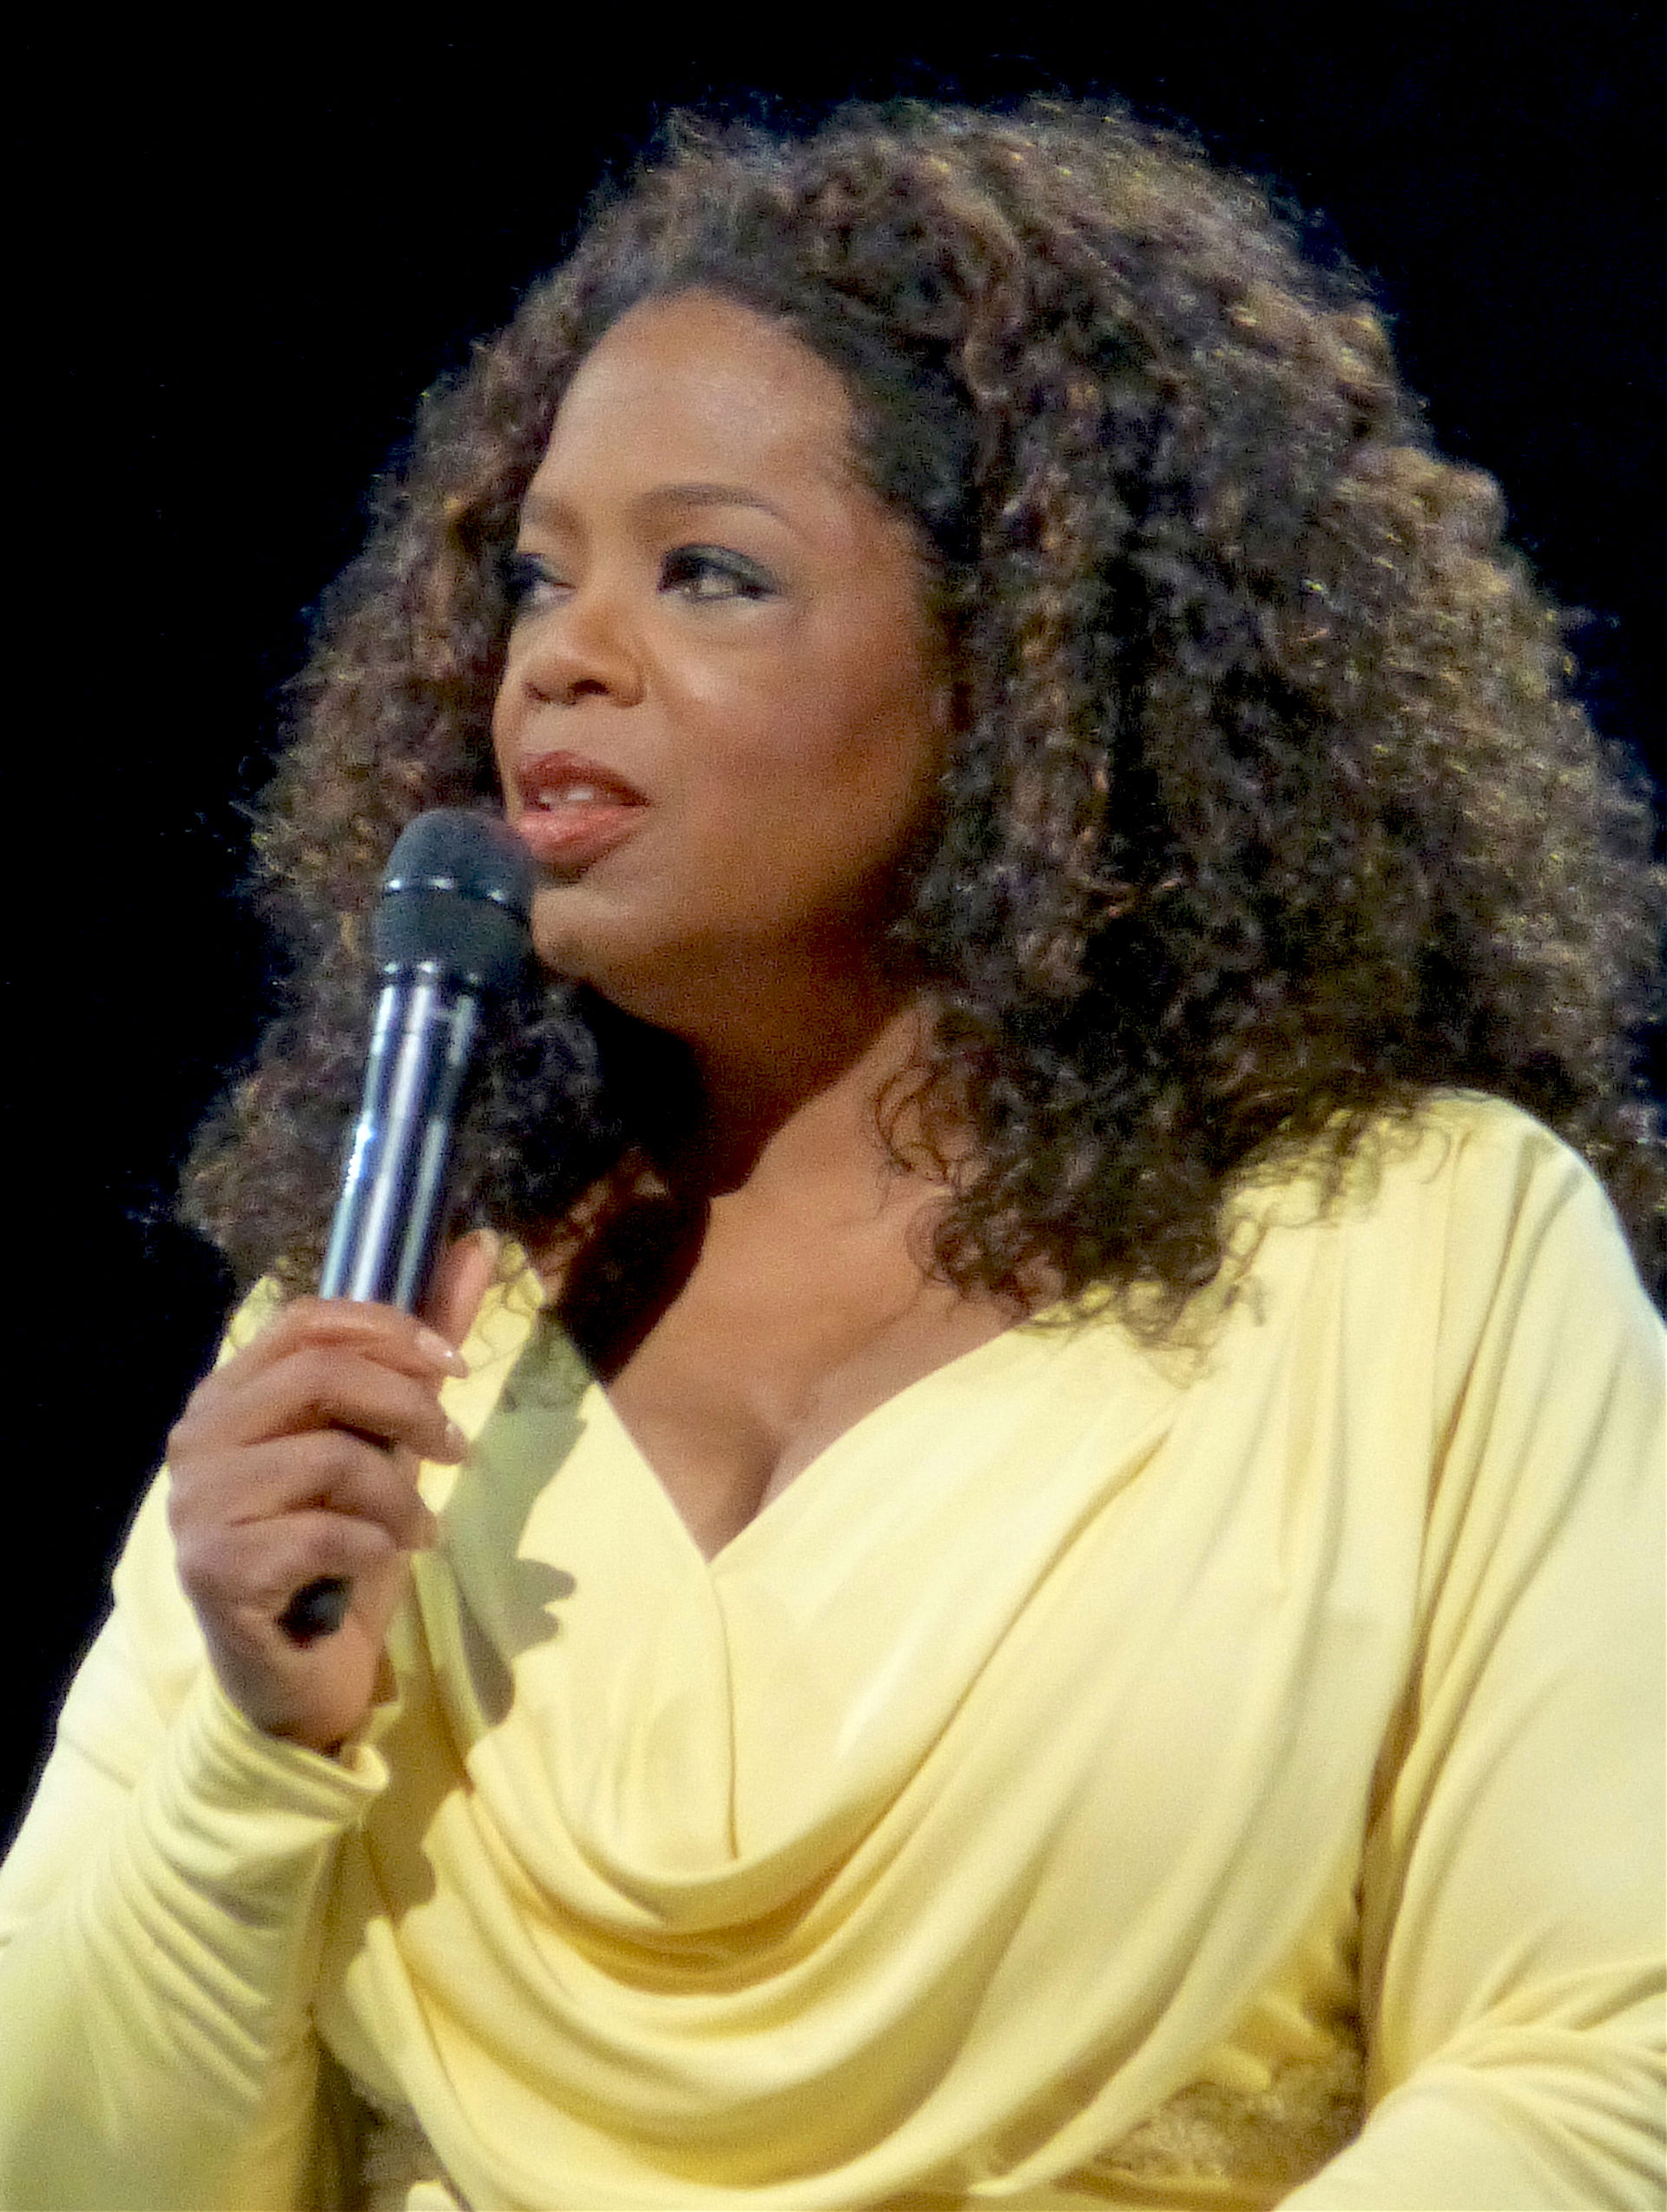 Photo of Oprah Winfrey: American businesswoman, talk show host, actress, producer, and philanthropist